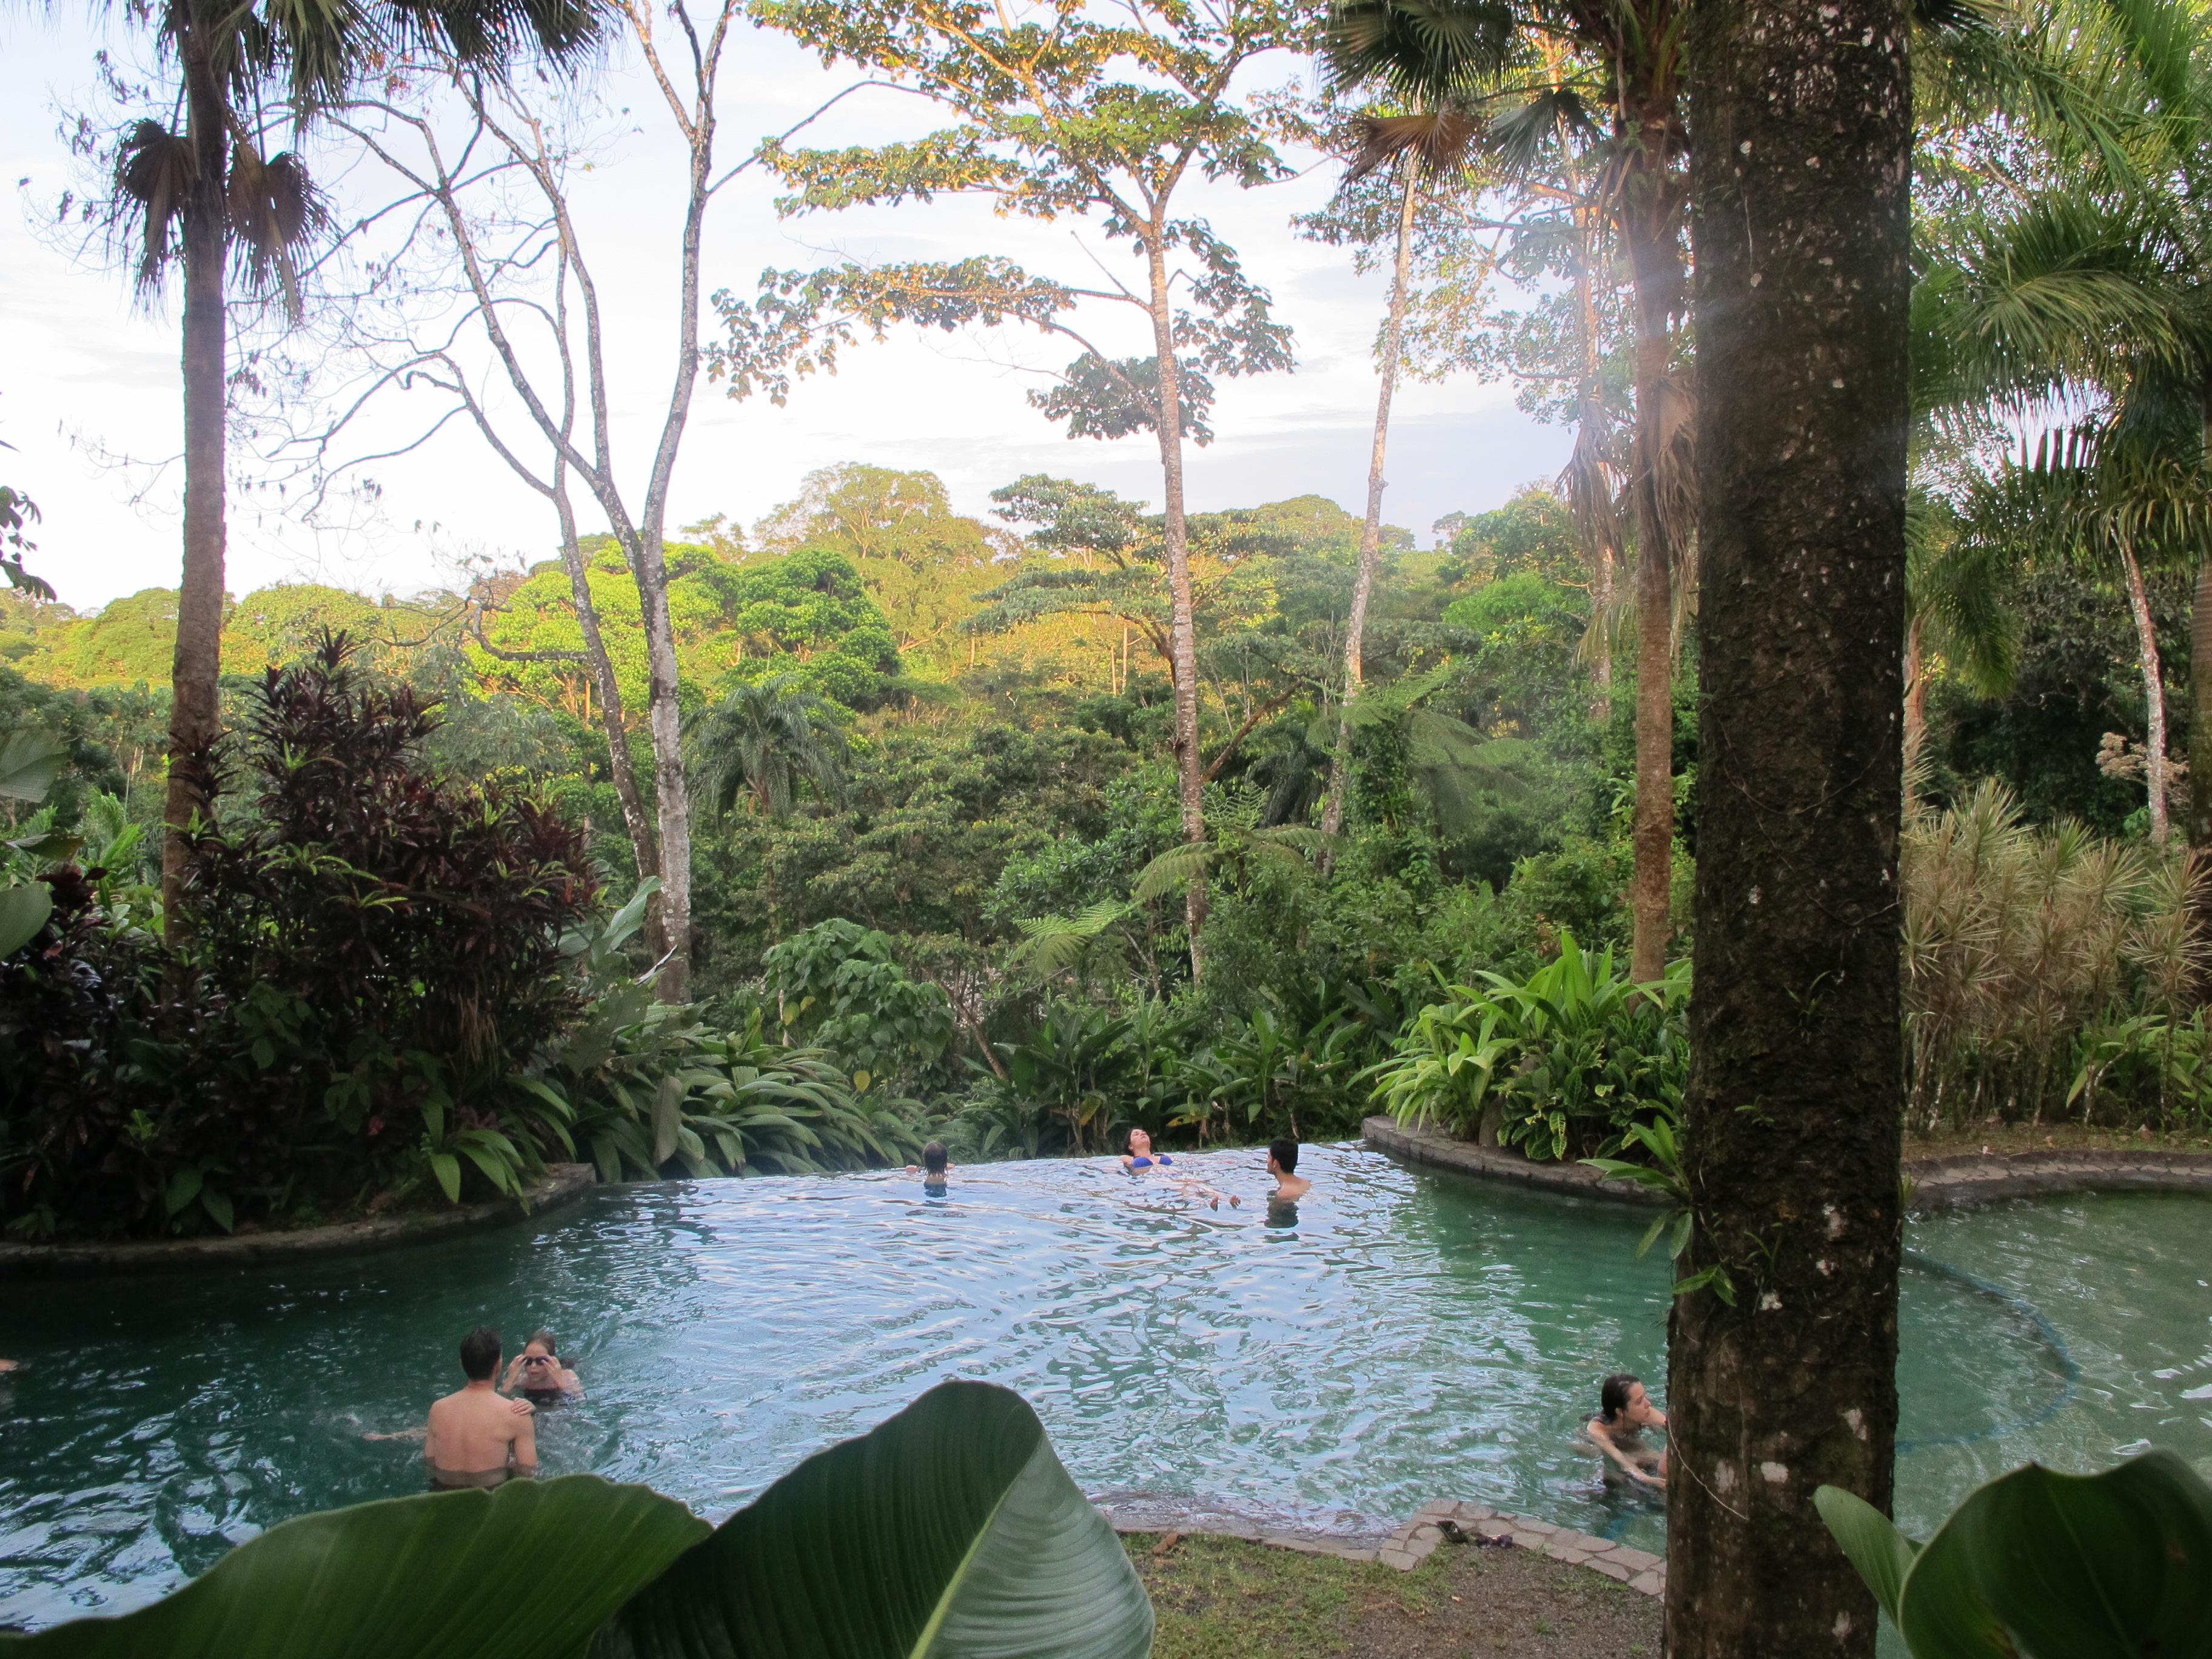 Savoring Slow Travel At The Sarapiquis Rainforest Lodge Everett Potters